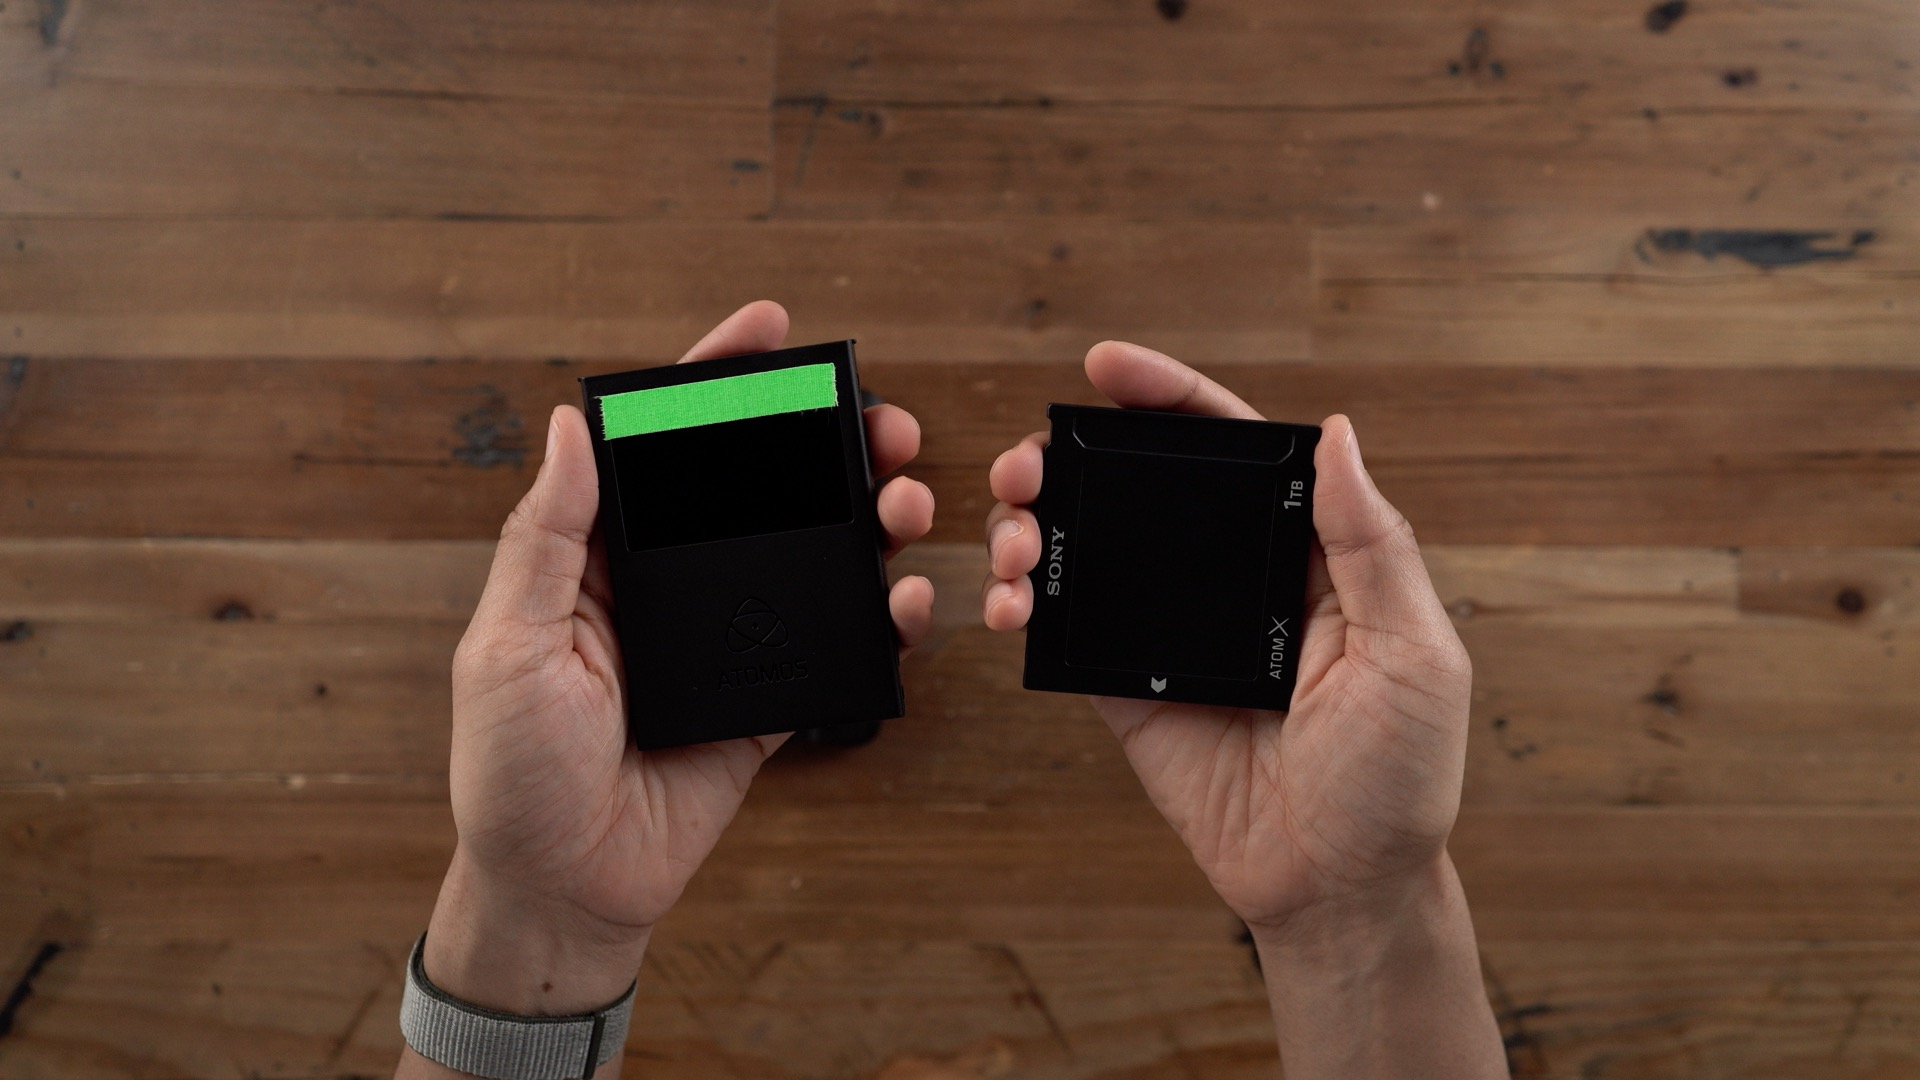 Atomos Ninja V Sony SSDmini vs MasterCaddy II